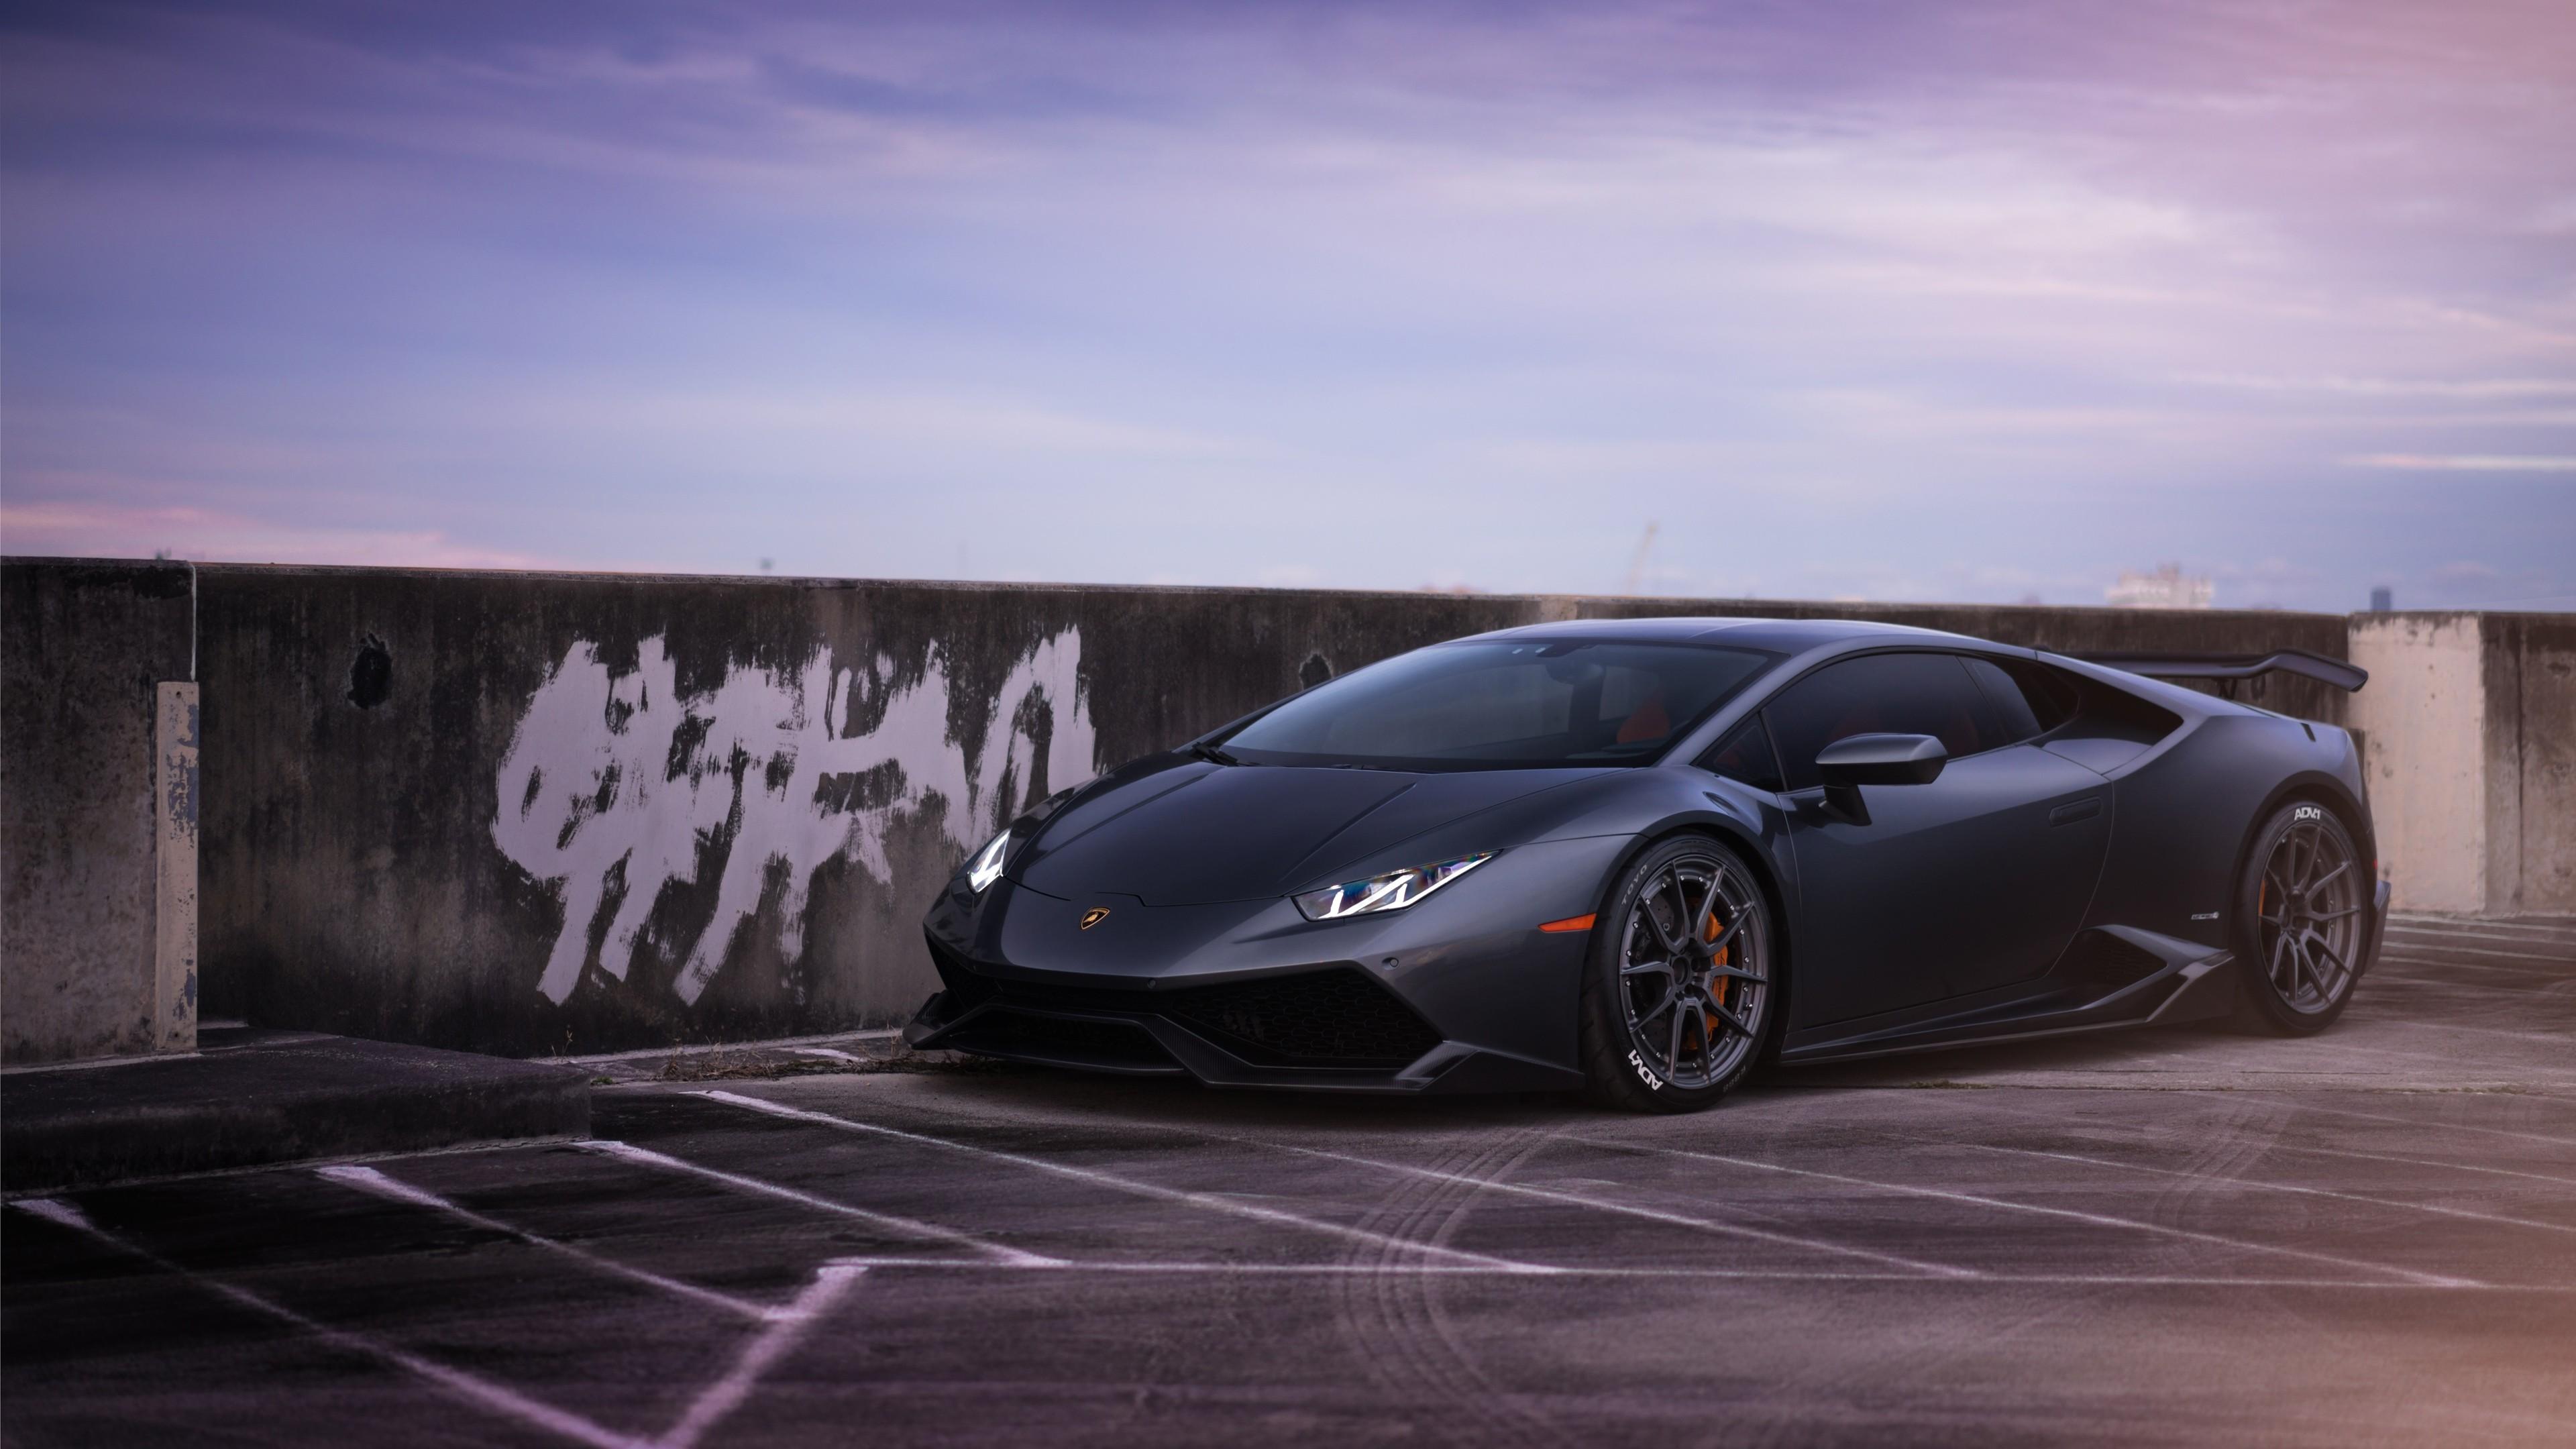 High Performance Car Pc Desktop Wallpaper Lamborghini Huracan On Adv1 Wheels 2 Wallpaper Hd Car